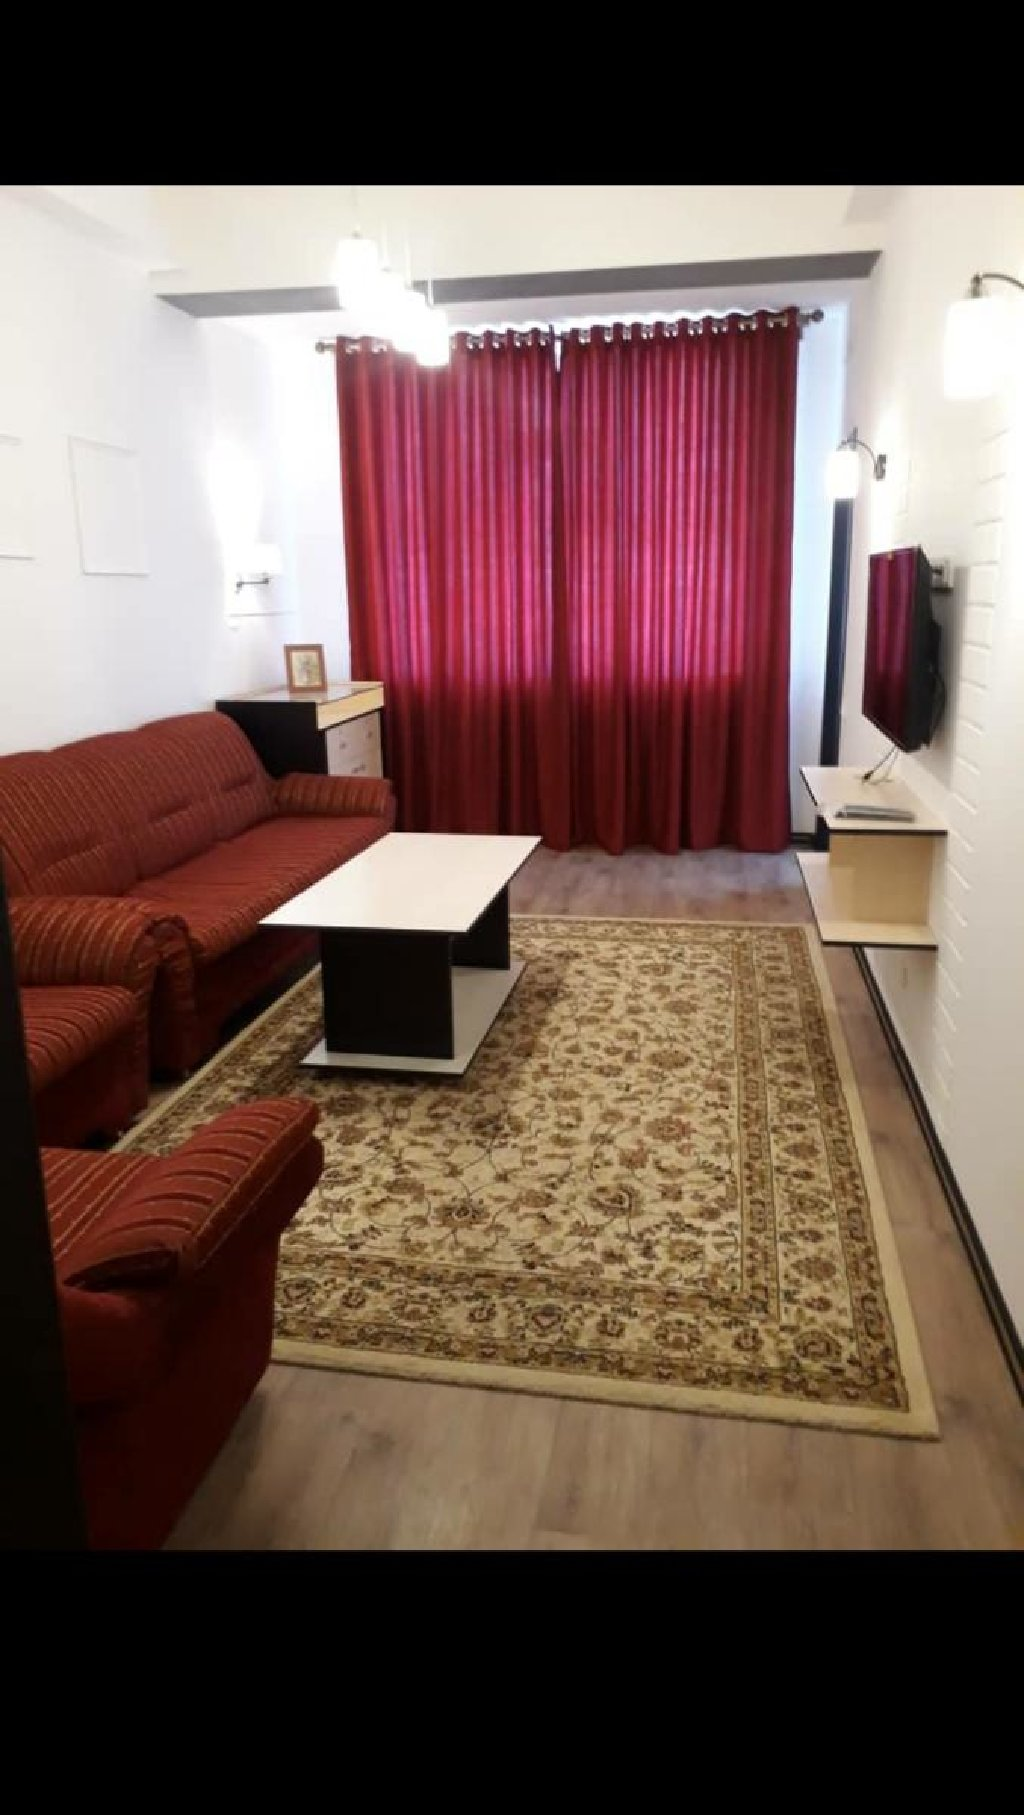 Сдается квартира: 3 комнаты, 90 кв. м, Бишкек: Сдается квартира: 3 комнаты, 90 кв. м, Бишкек